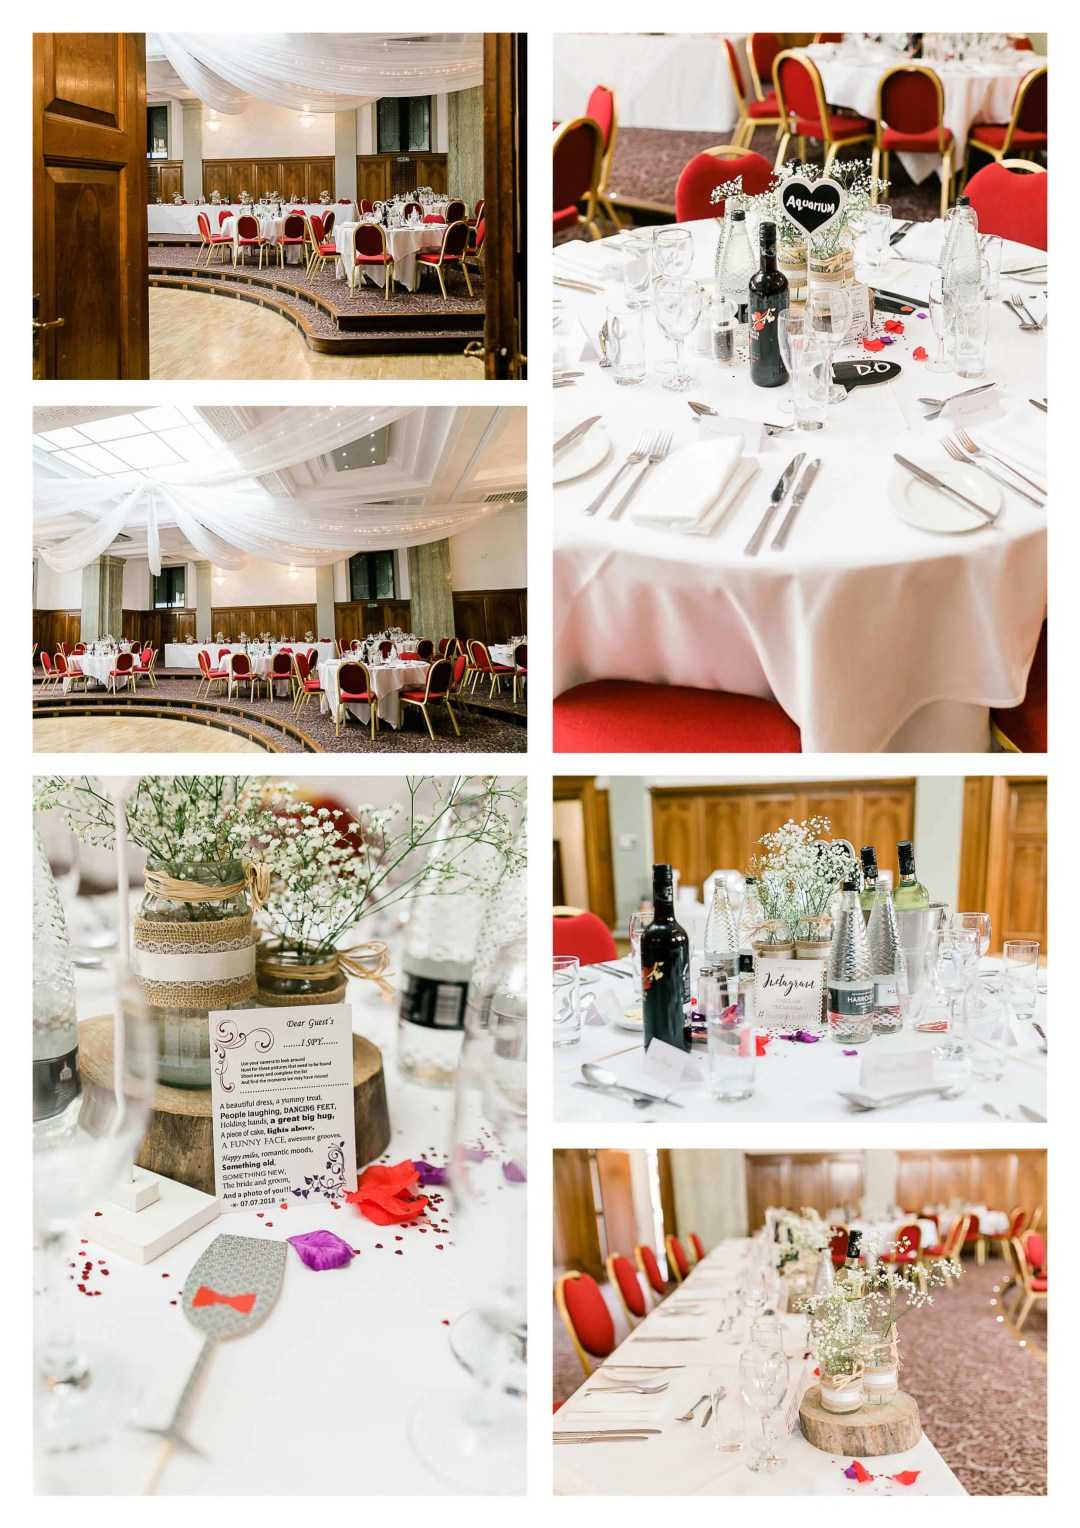 Pelham House Wedding Venue near Lewes Castle Brighton Wedding Photographer